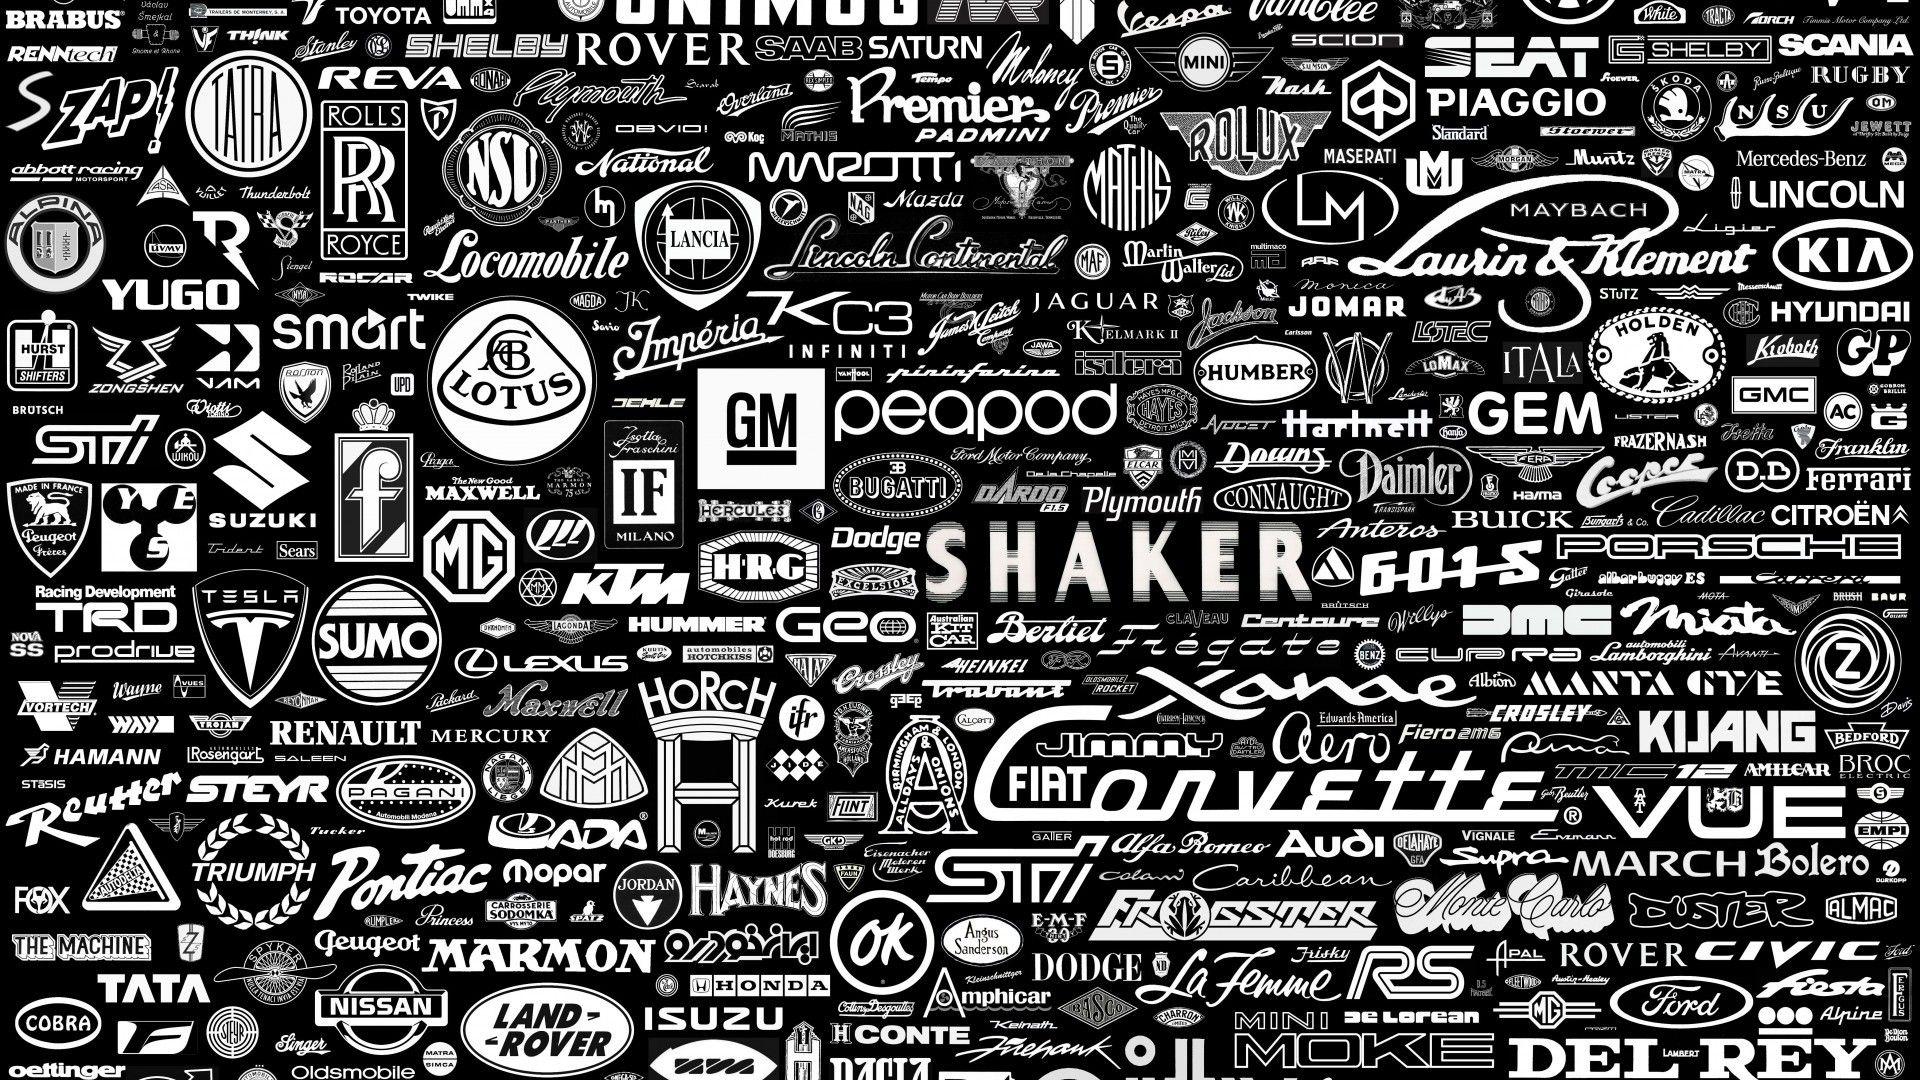 Good Wallpaper Logo Collage - 630693cfffaa8eed57035d96f504252b  Image_21821.jpg